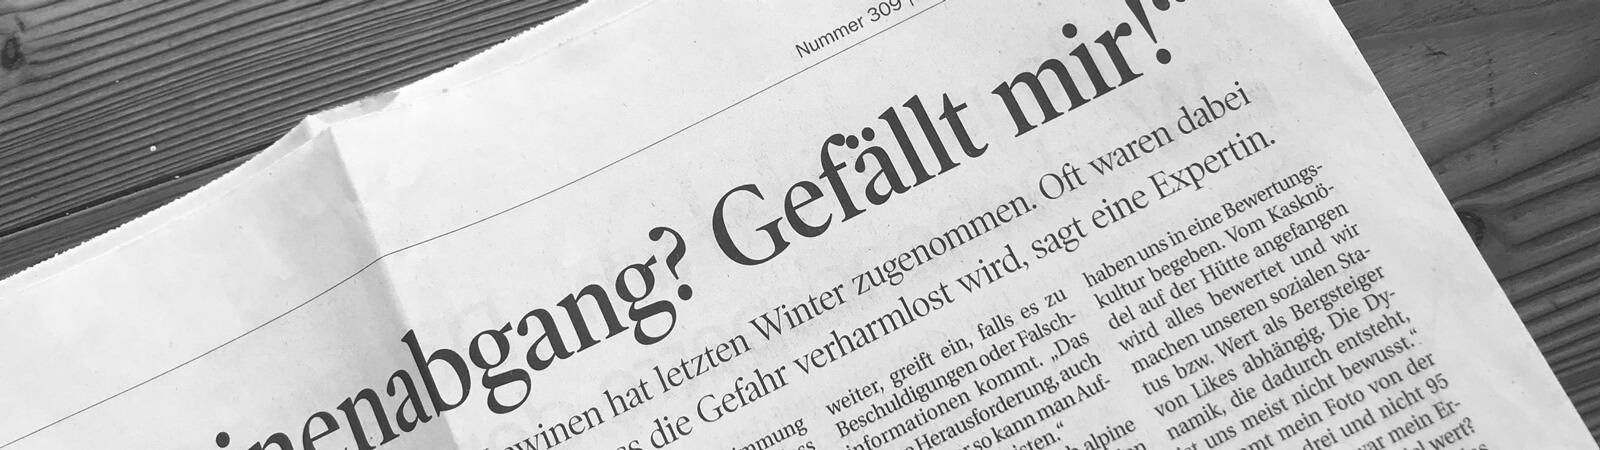 """Lawinenabgang? Gefällt mir!"" in der Tiroler Tageszeitung"